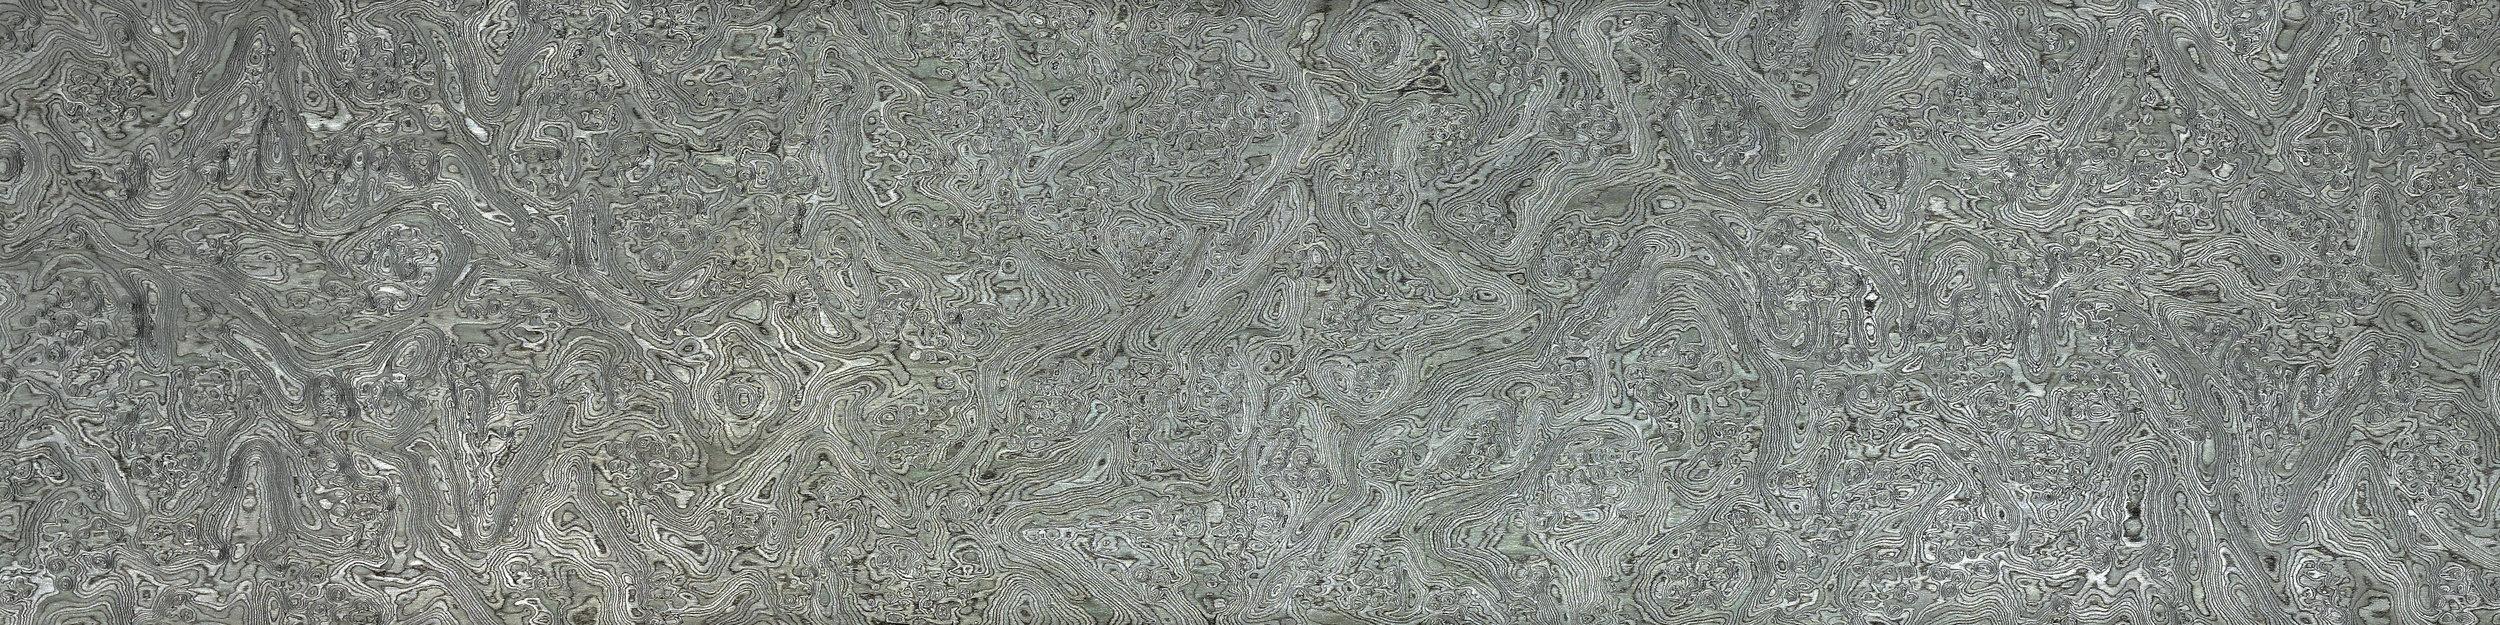 Vavona 11.08 Pearl Grey Vavona.jpg